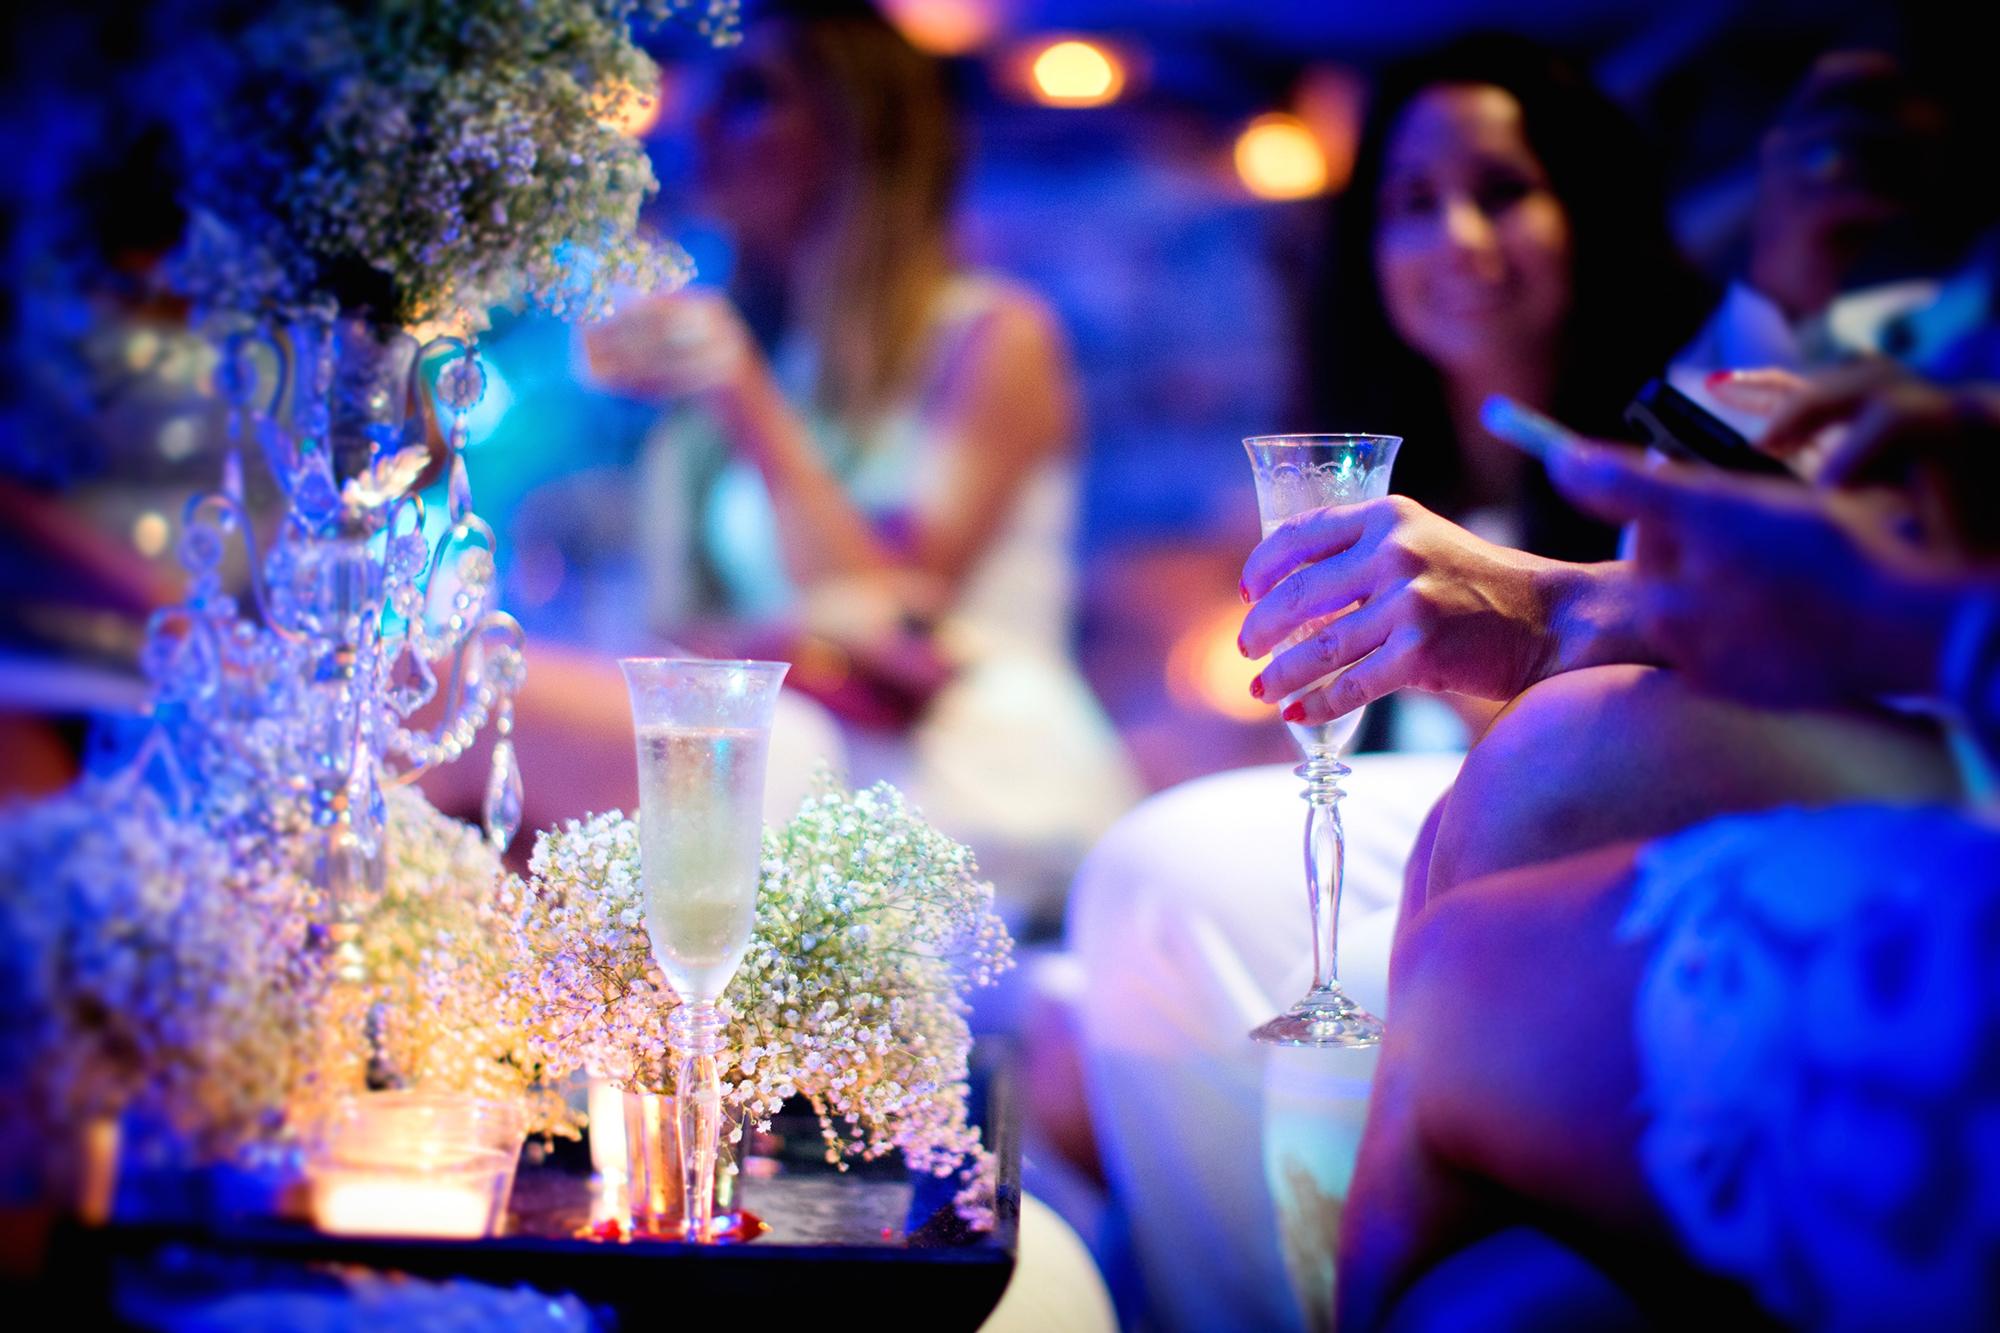 champaigne-glass-white-party-mario-lopez.jpg